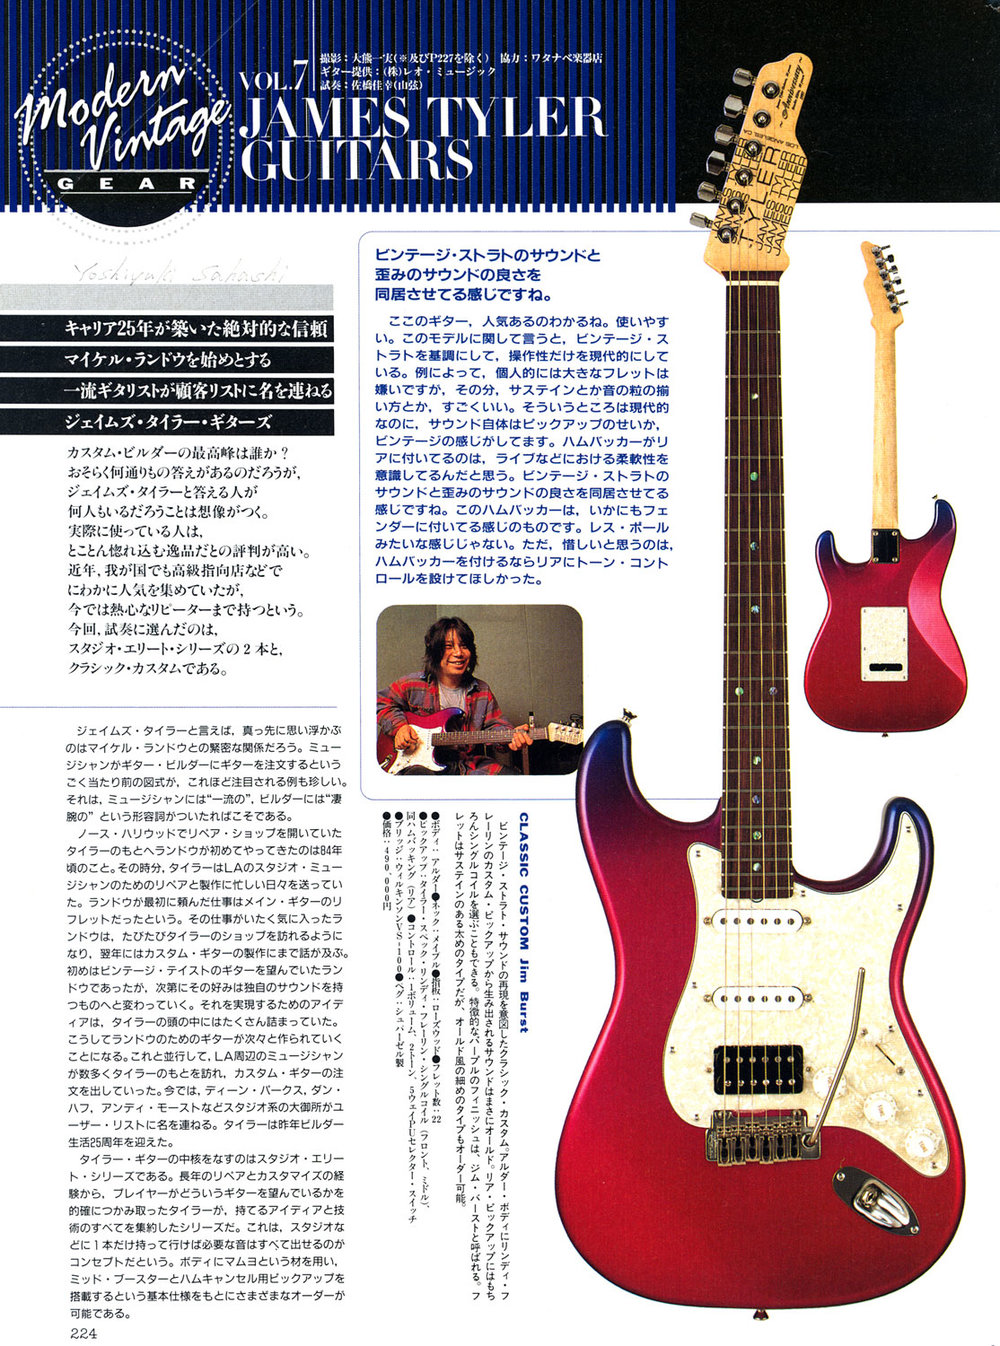 1998 Guitar Magazine